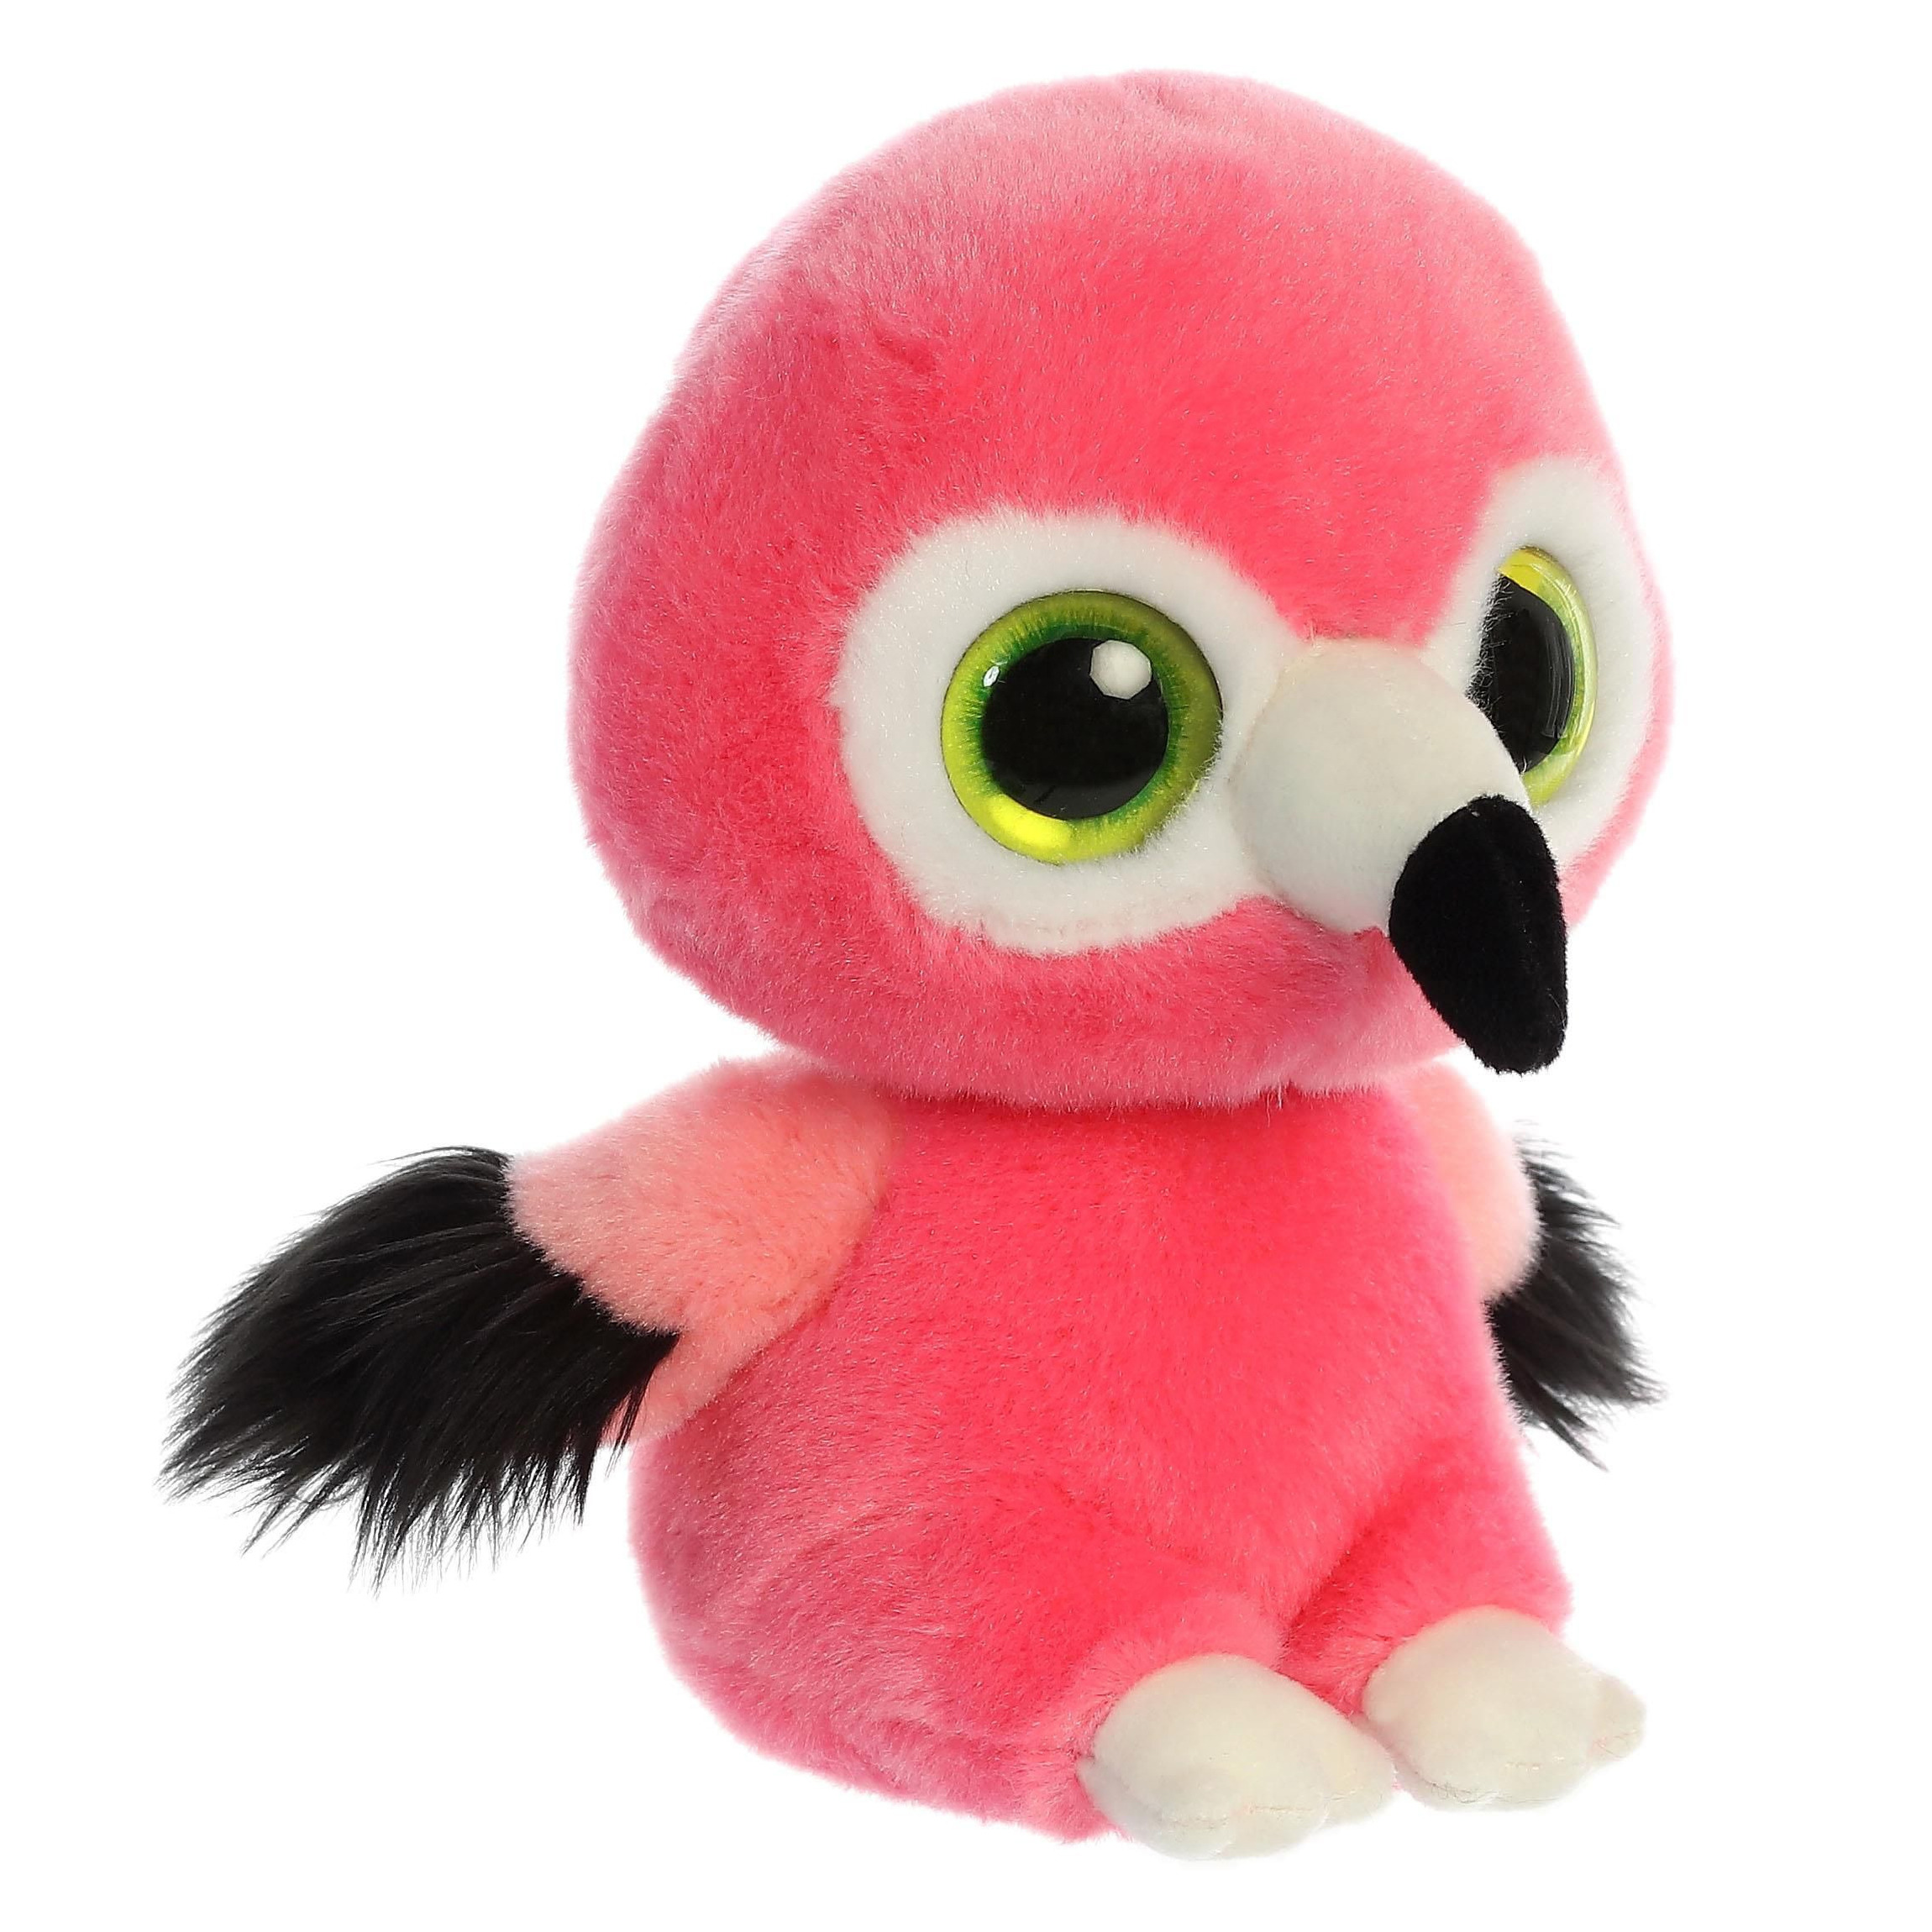 Pluche flamingo knuffel 20 cm